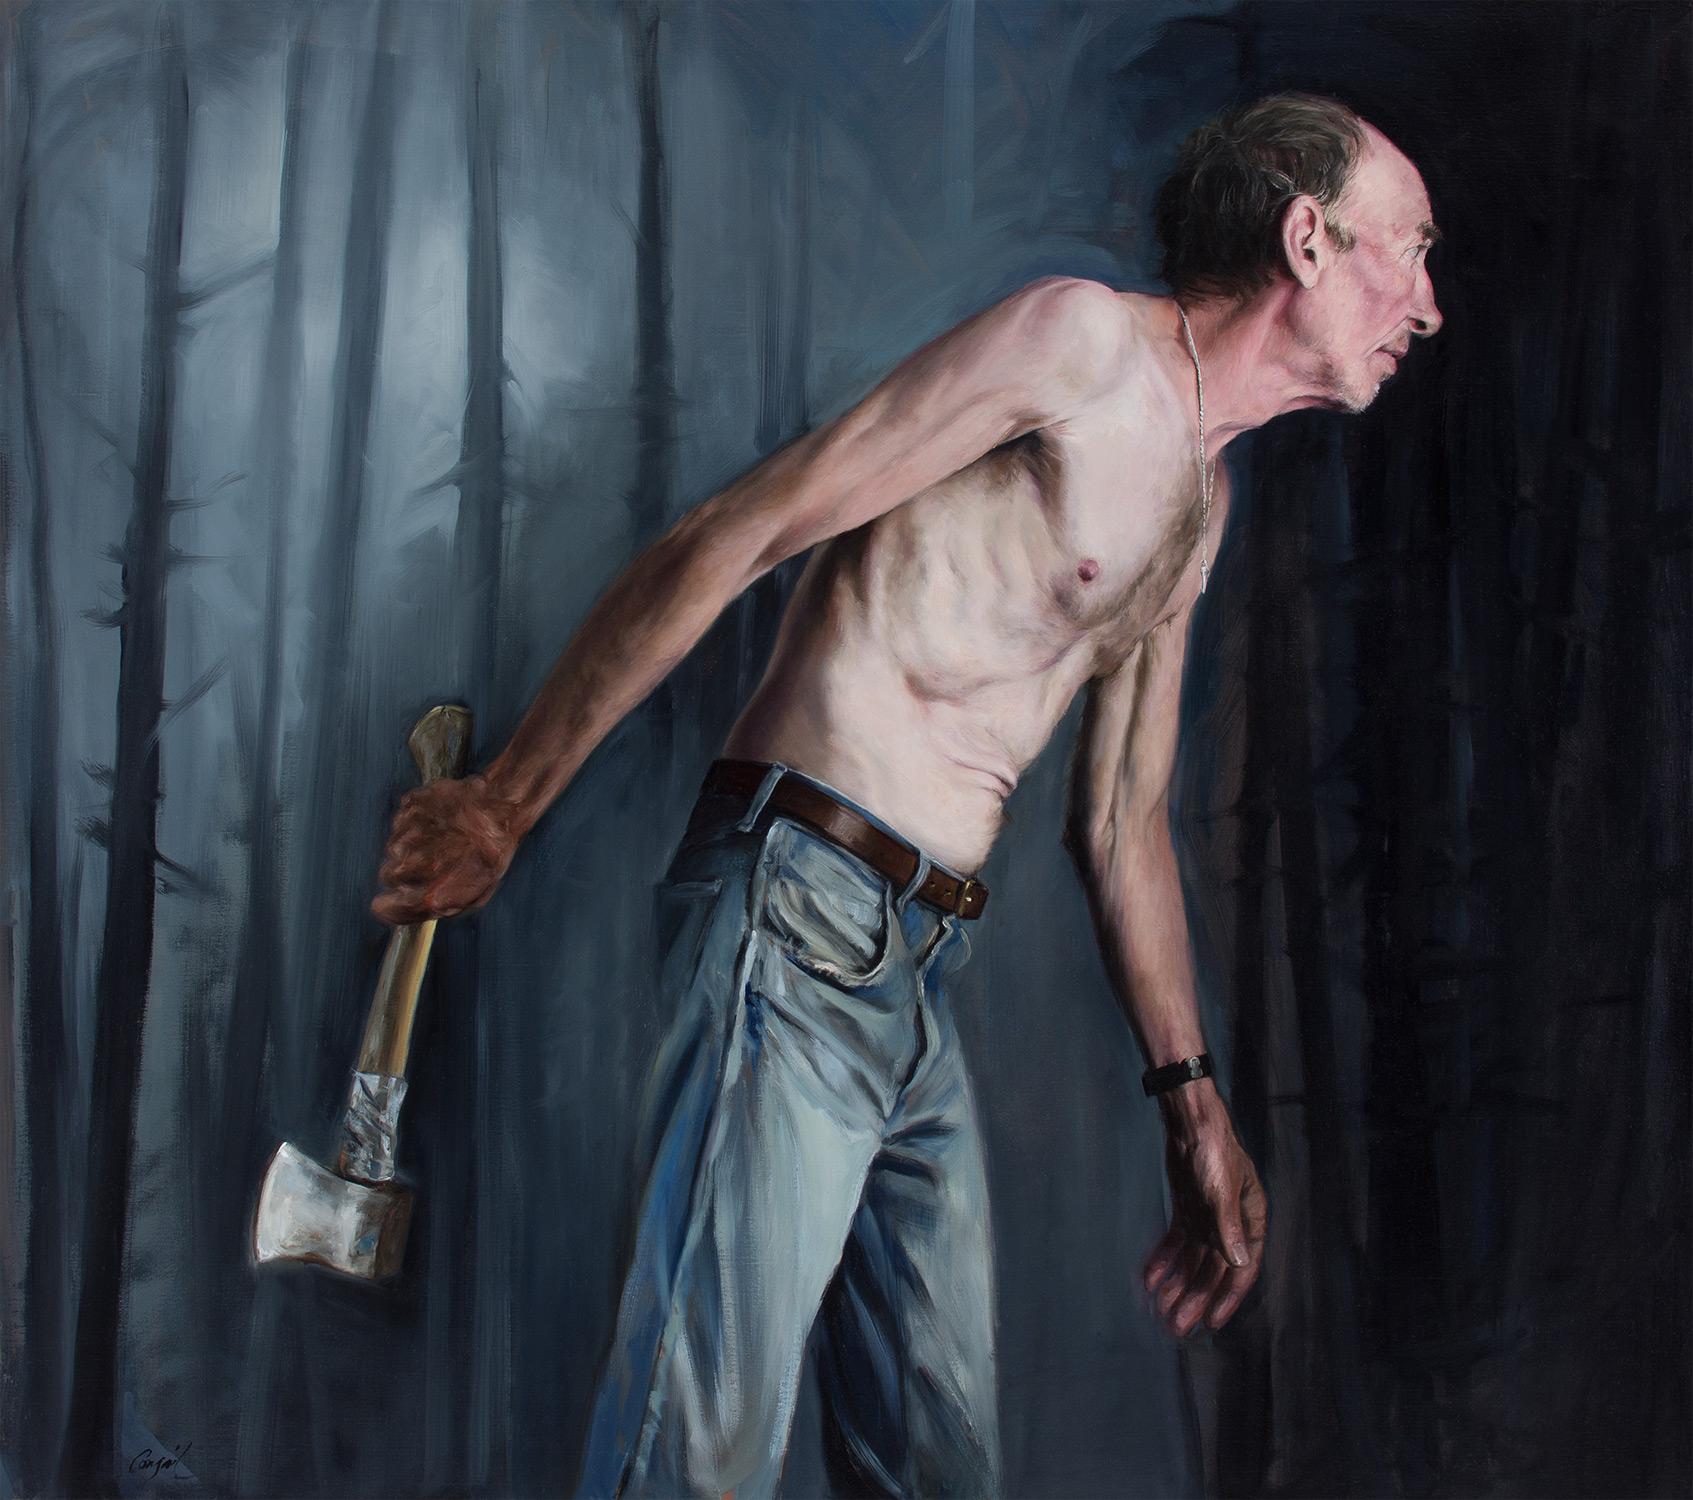 hatchet man (careful with that axe, Eugene)